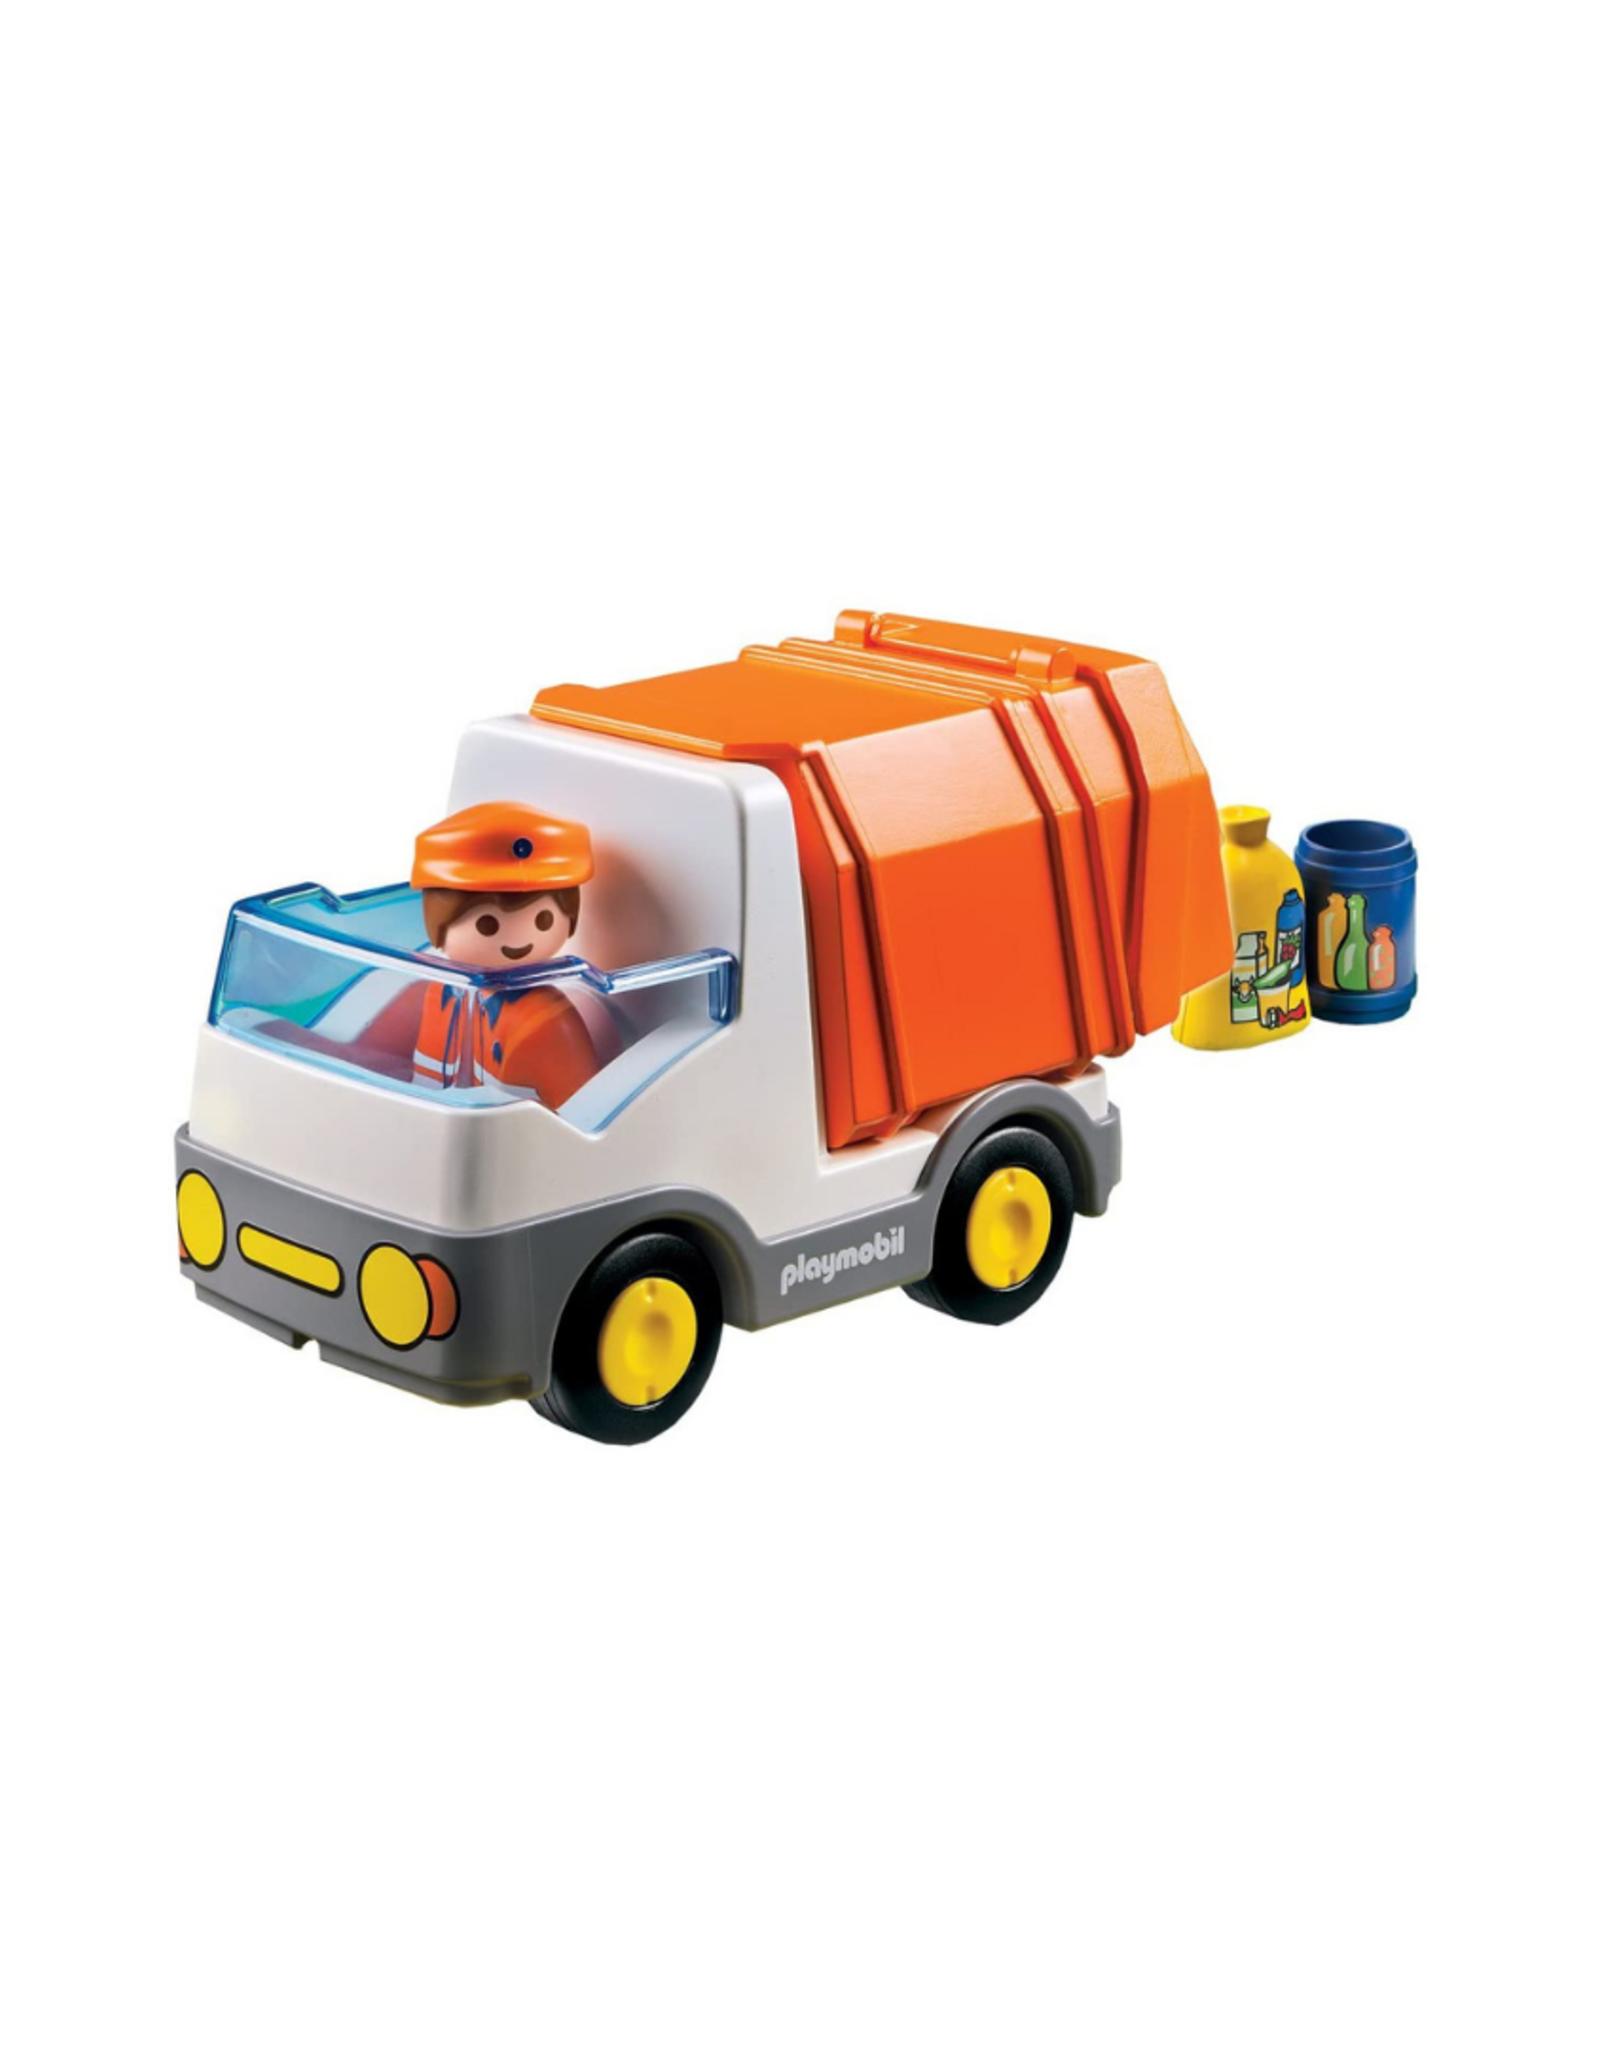 Playmobil PM - 1.2.3 Recycling Truck